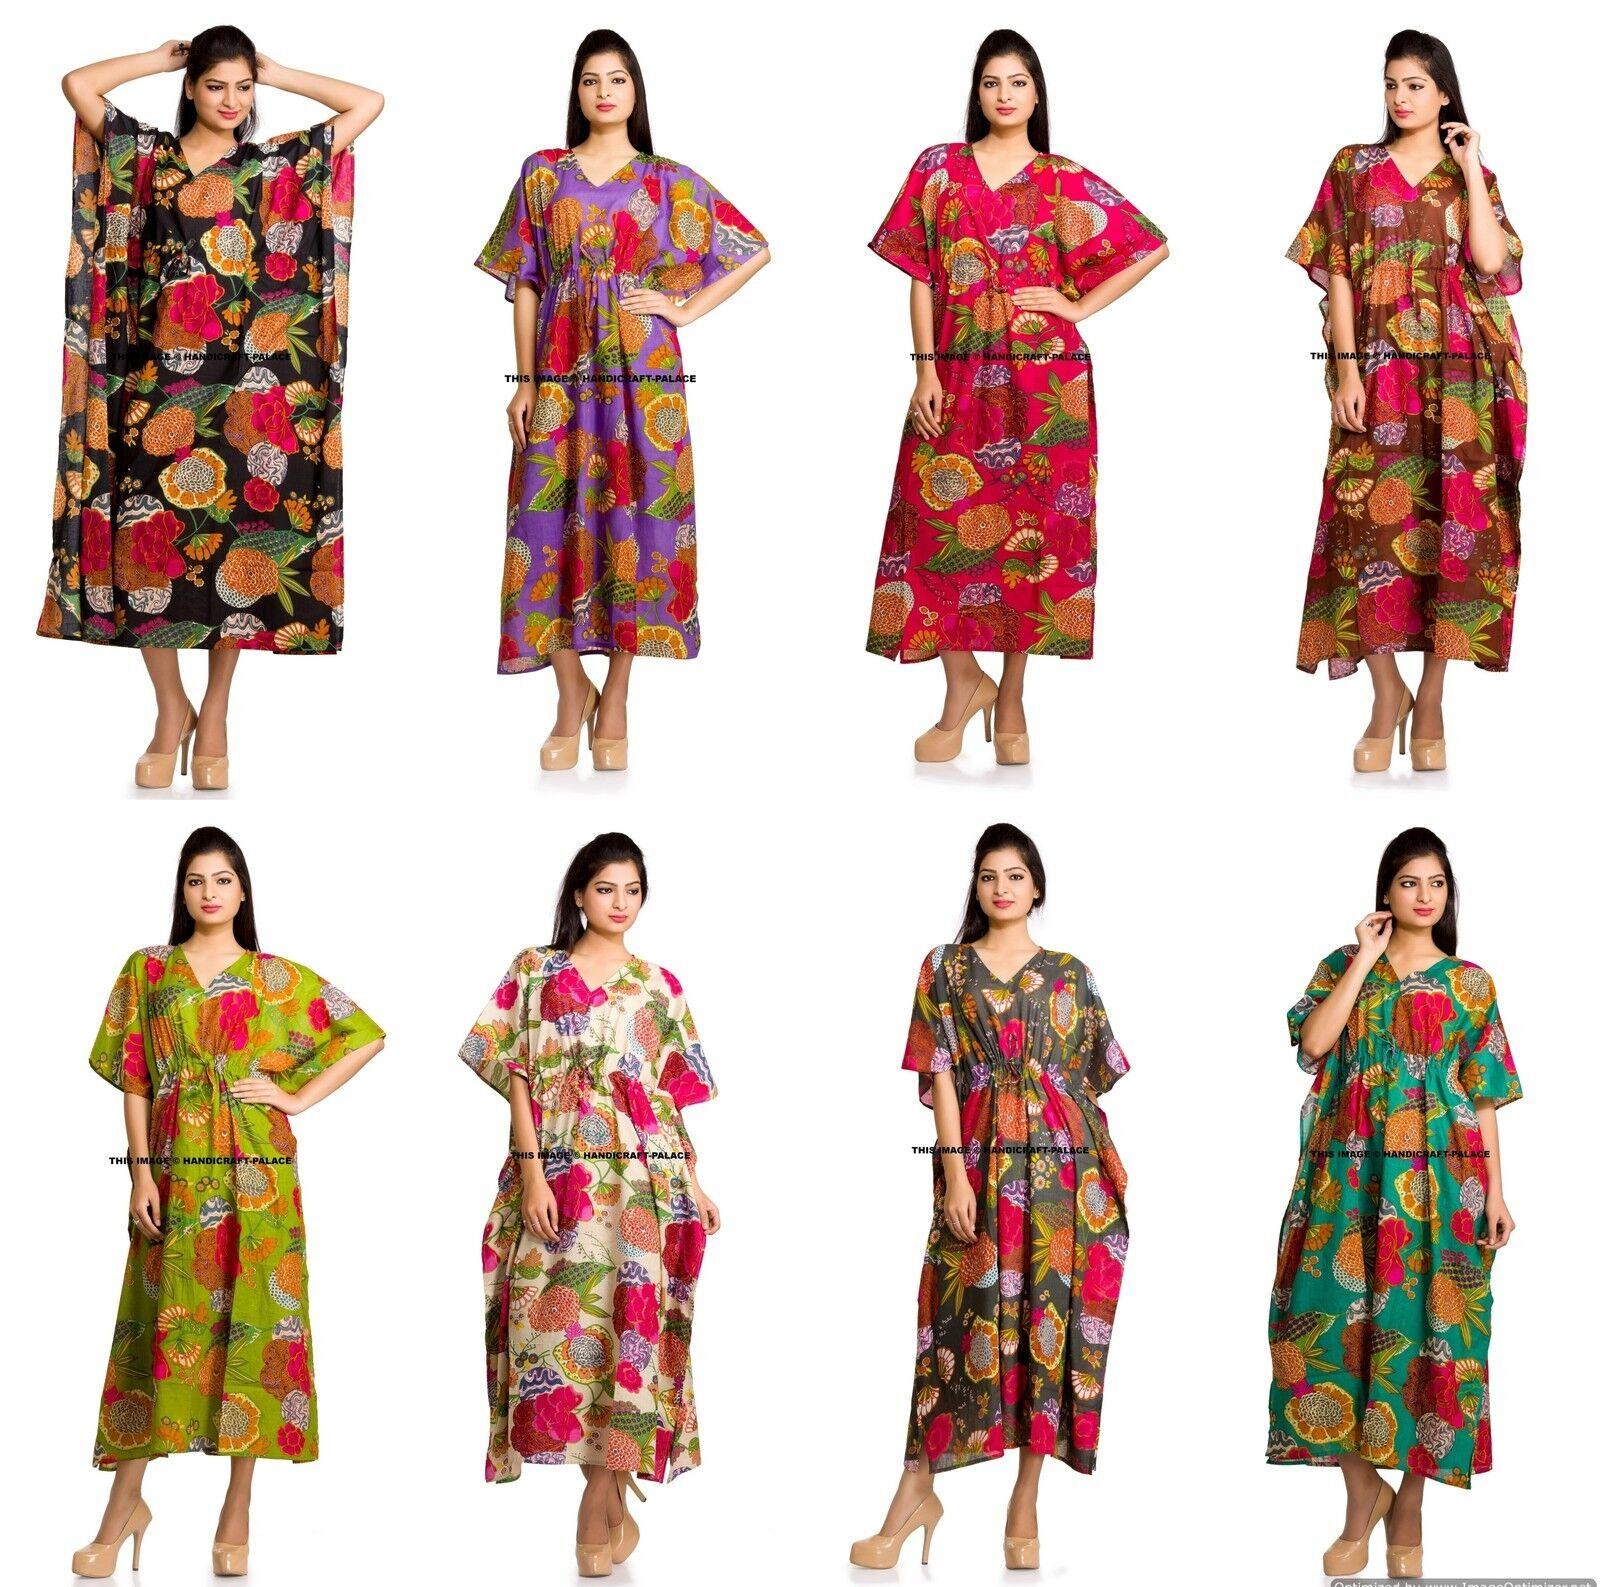 Großhandel Viel 20 PC Lang Strand Maxi Kaftan Kleid Sortierte Farben One Größe